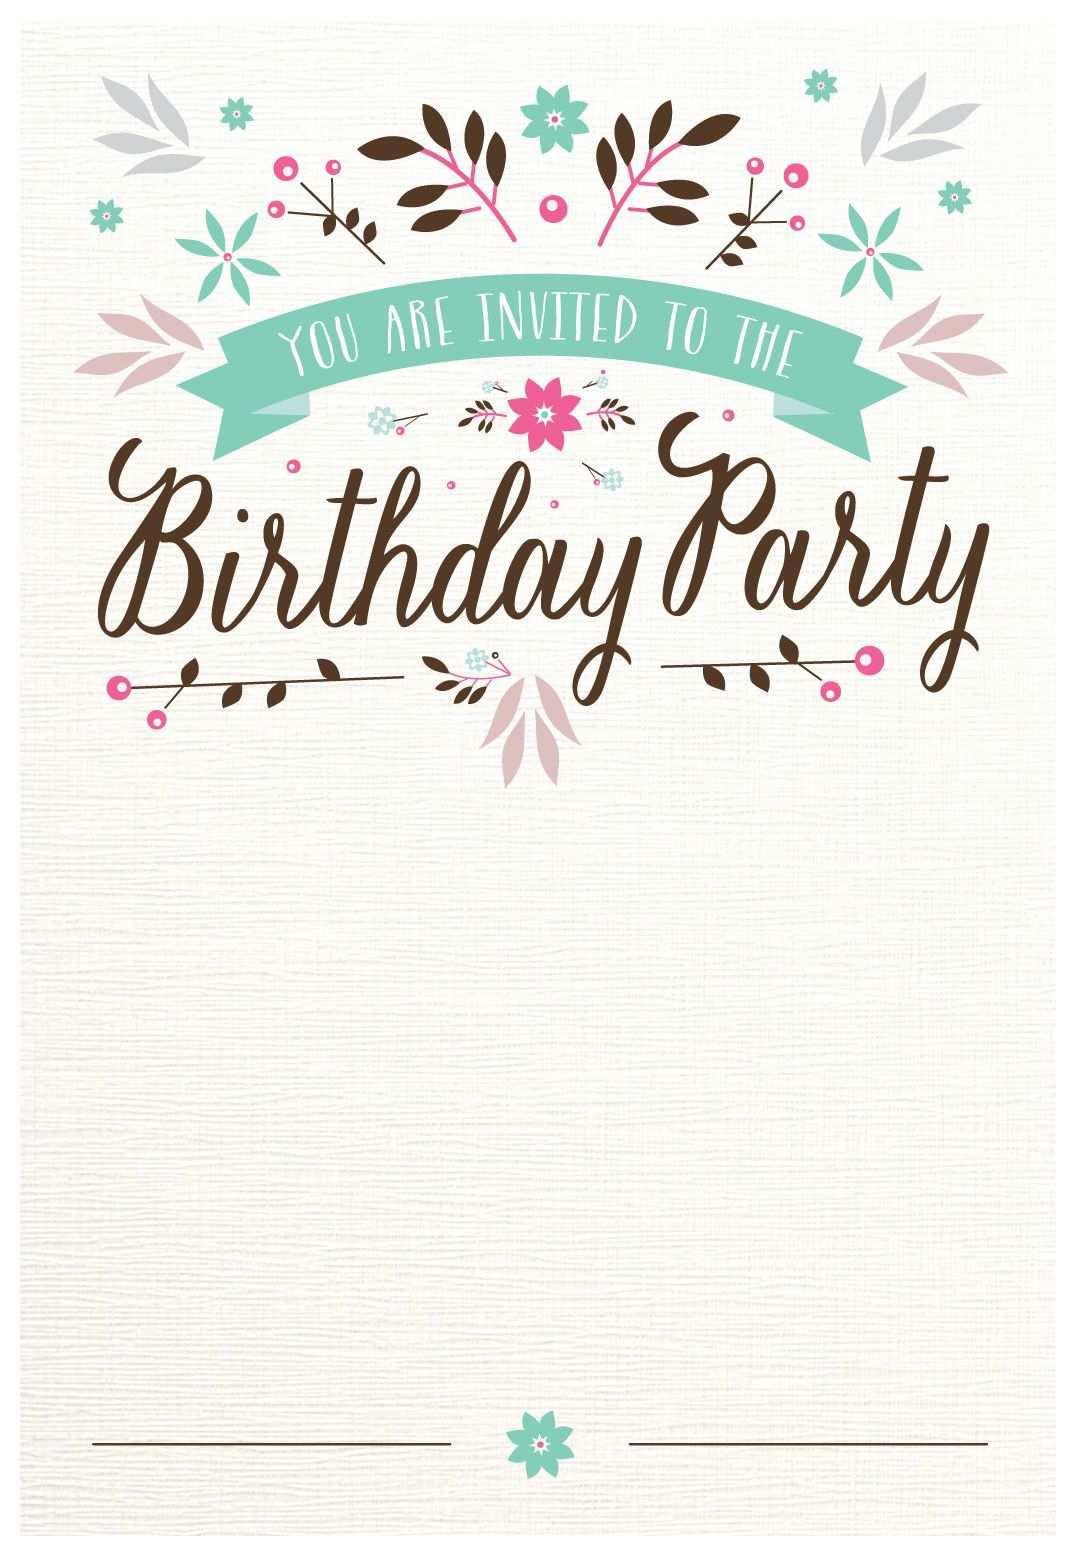 71 Printable Birthday Invitation Template Nz in Word for Birthday Invitation Template Nz